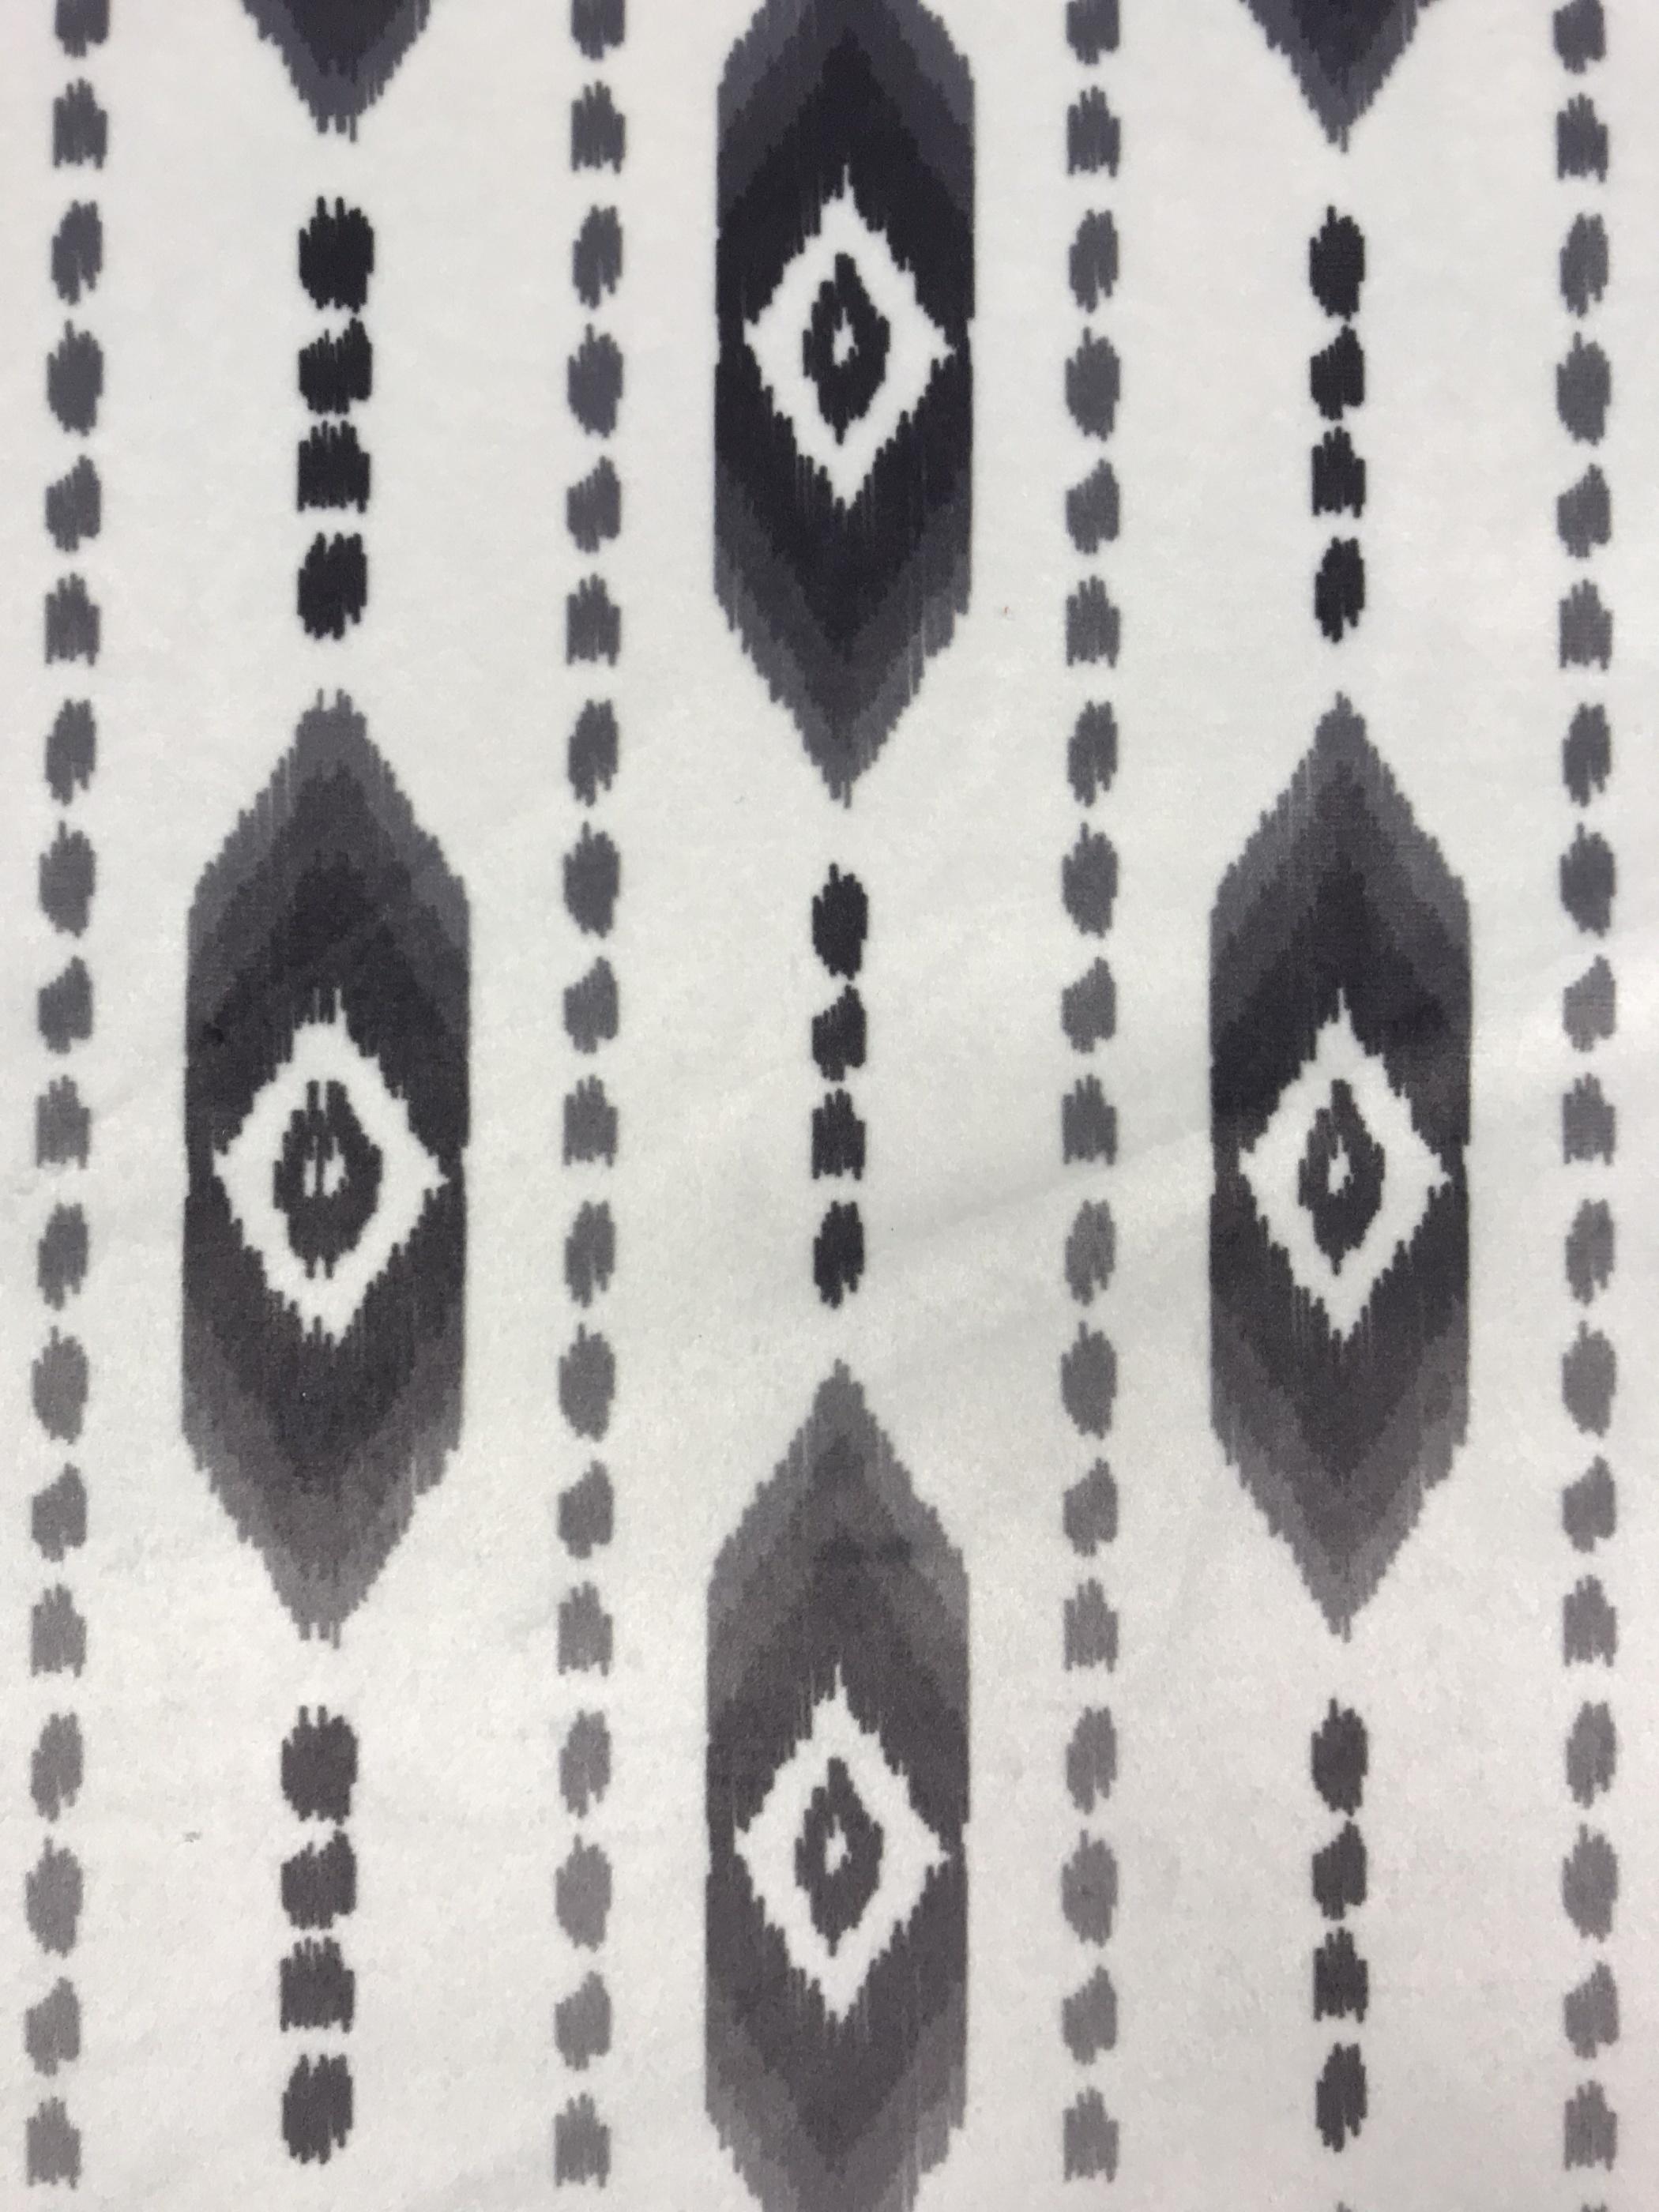 inka vit sammet metervara tyg